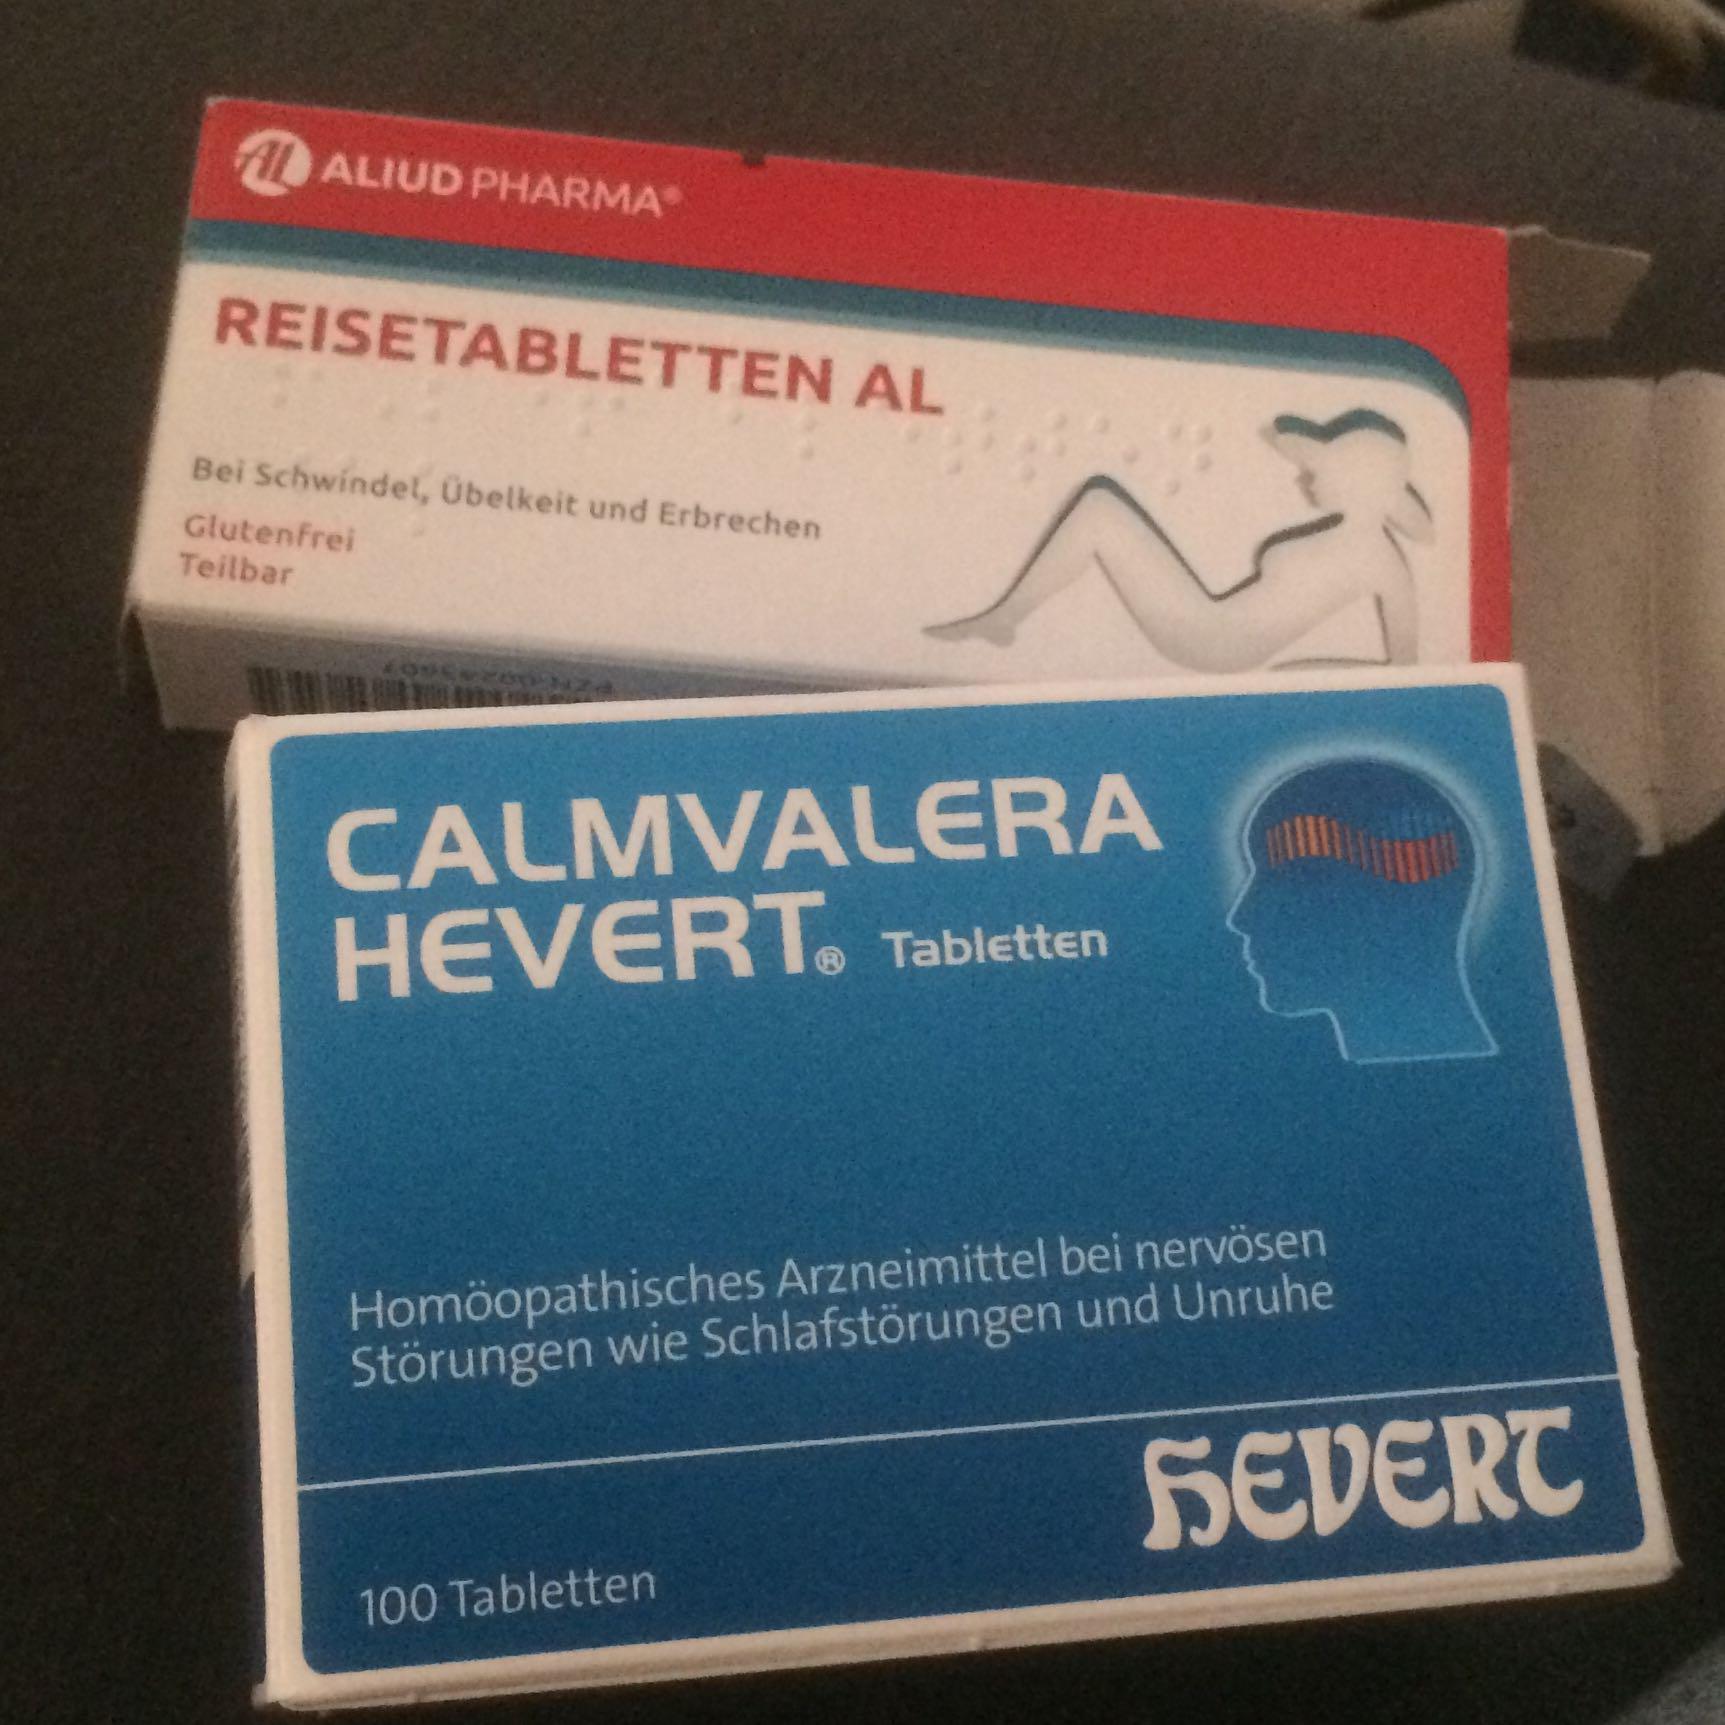 Rezeptfreie antidepressiva und reisetabletten al